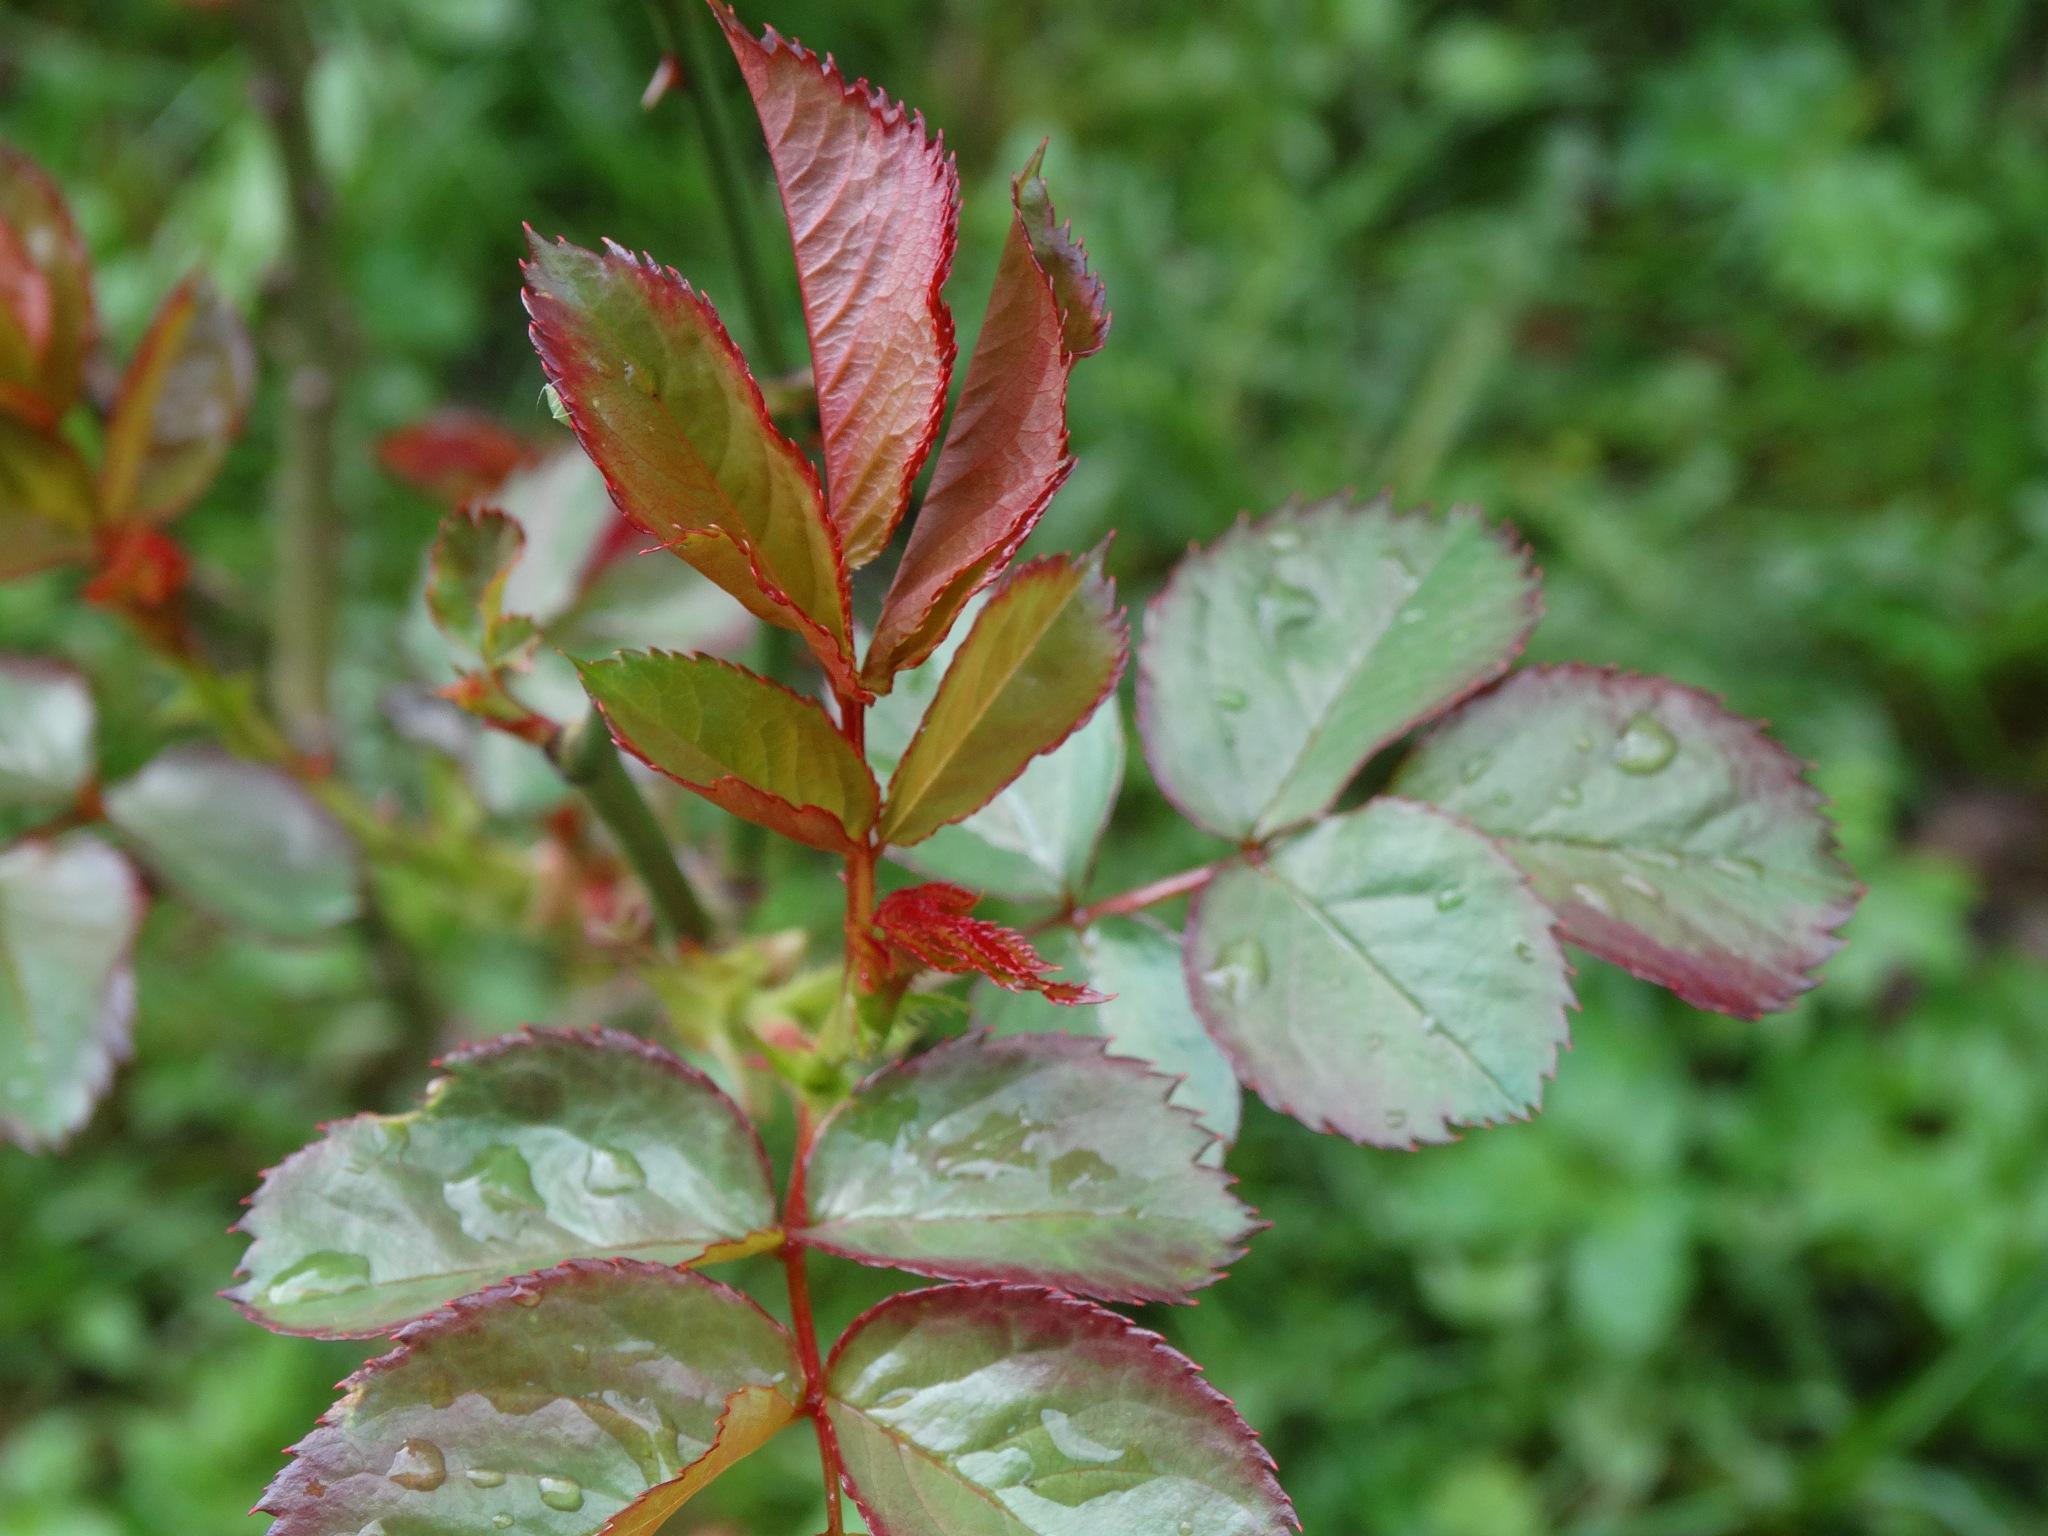 Leaves of the rose - Liście róży by Marzenna Głogowska